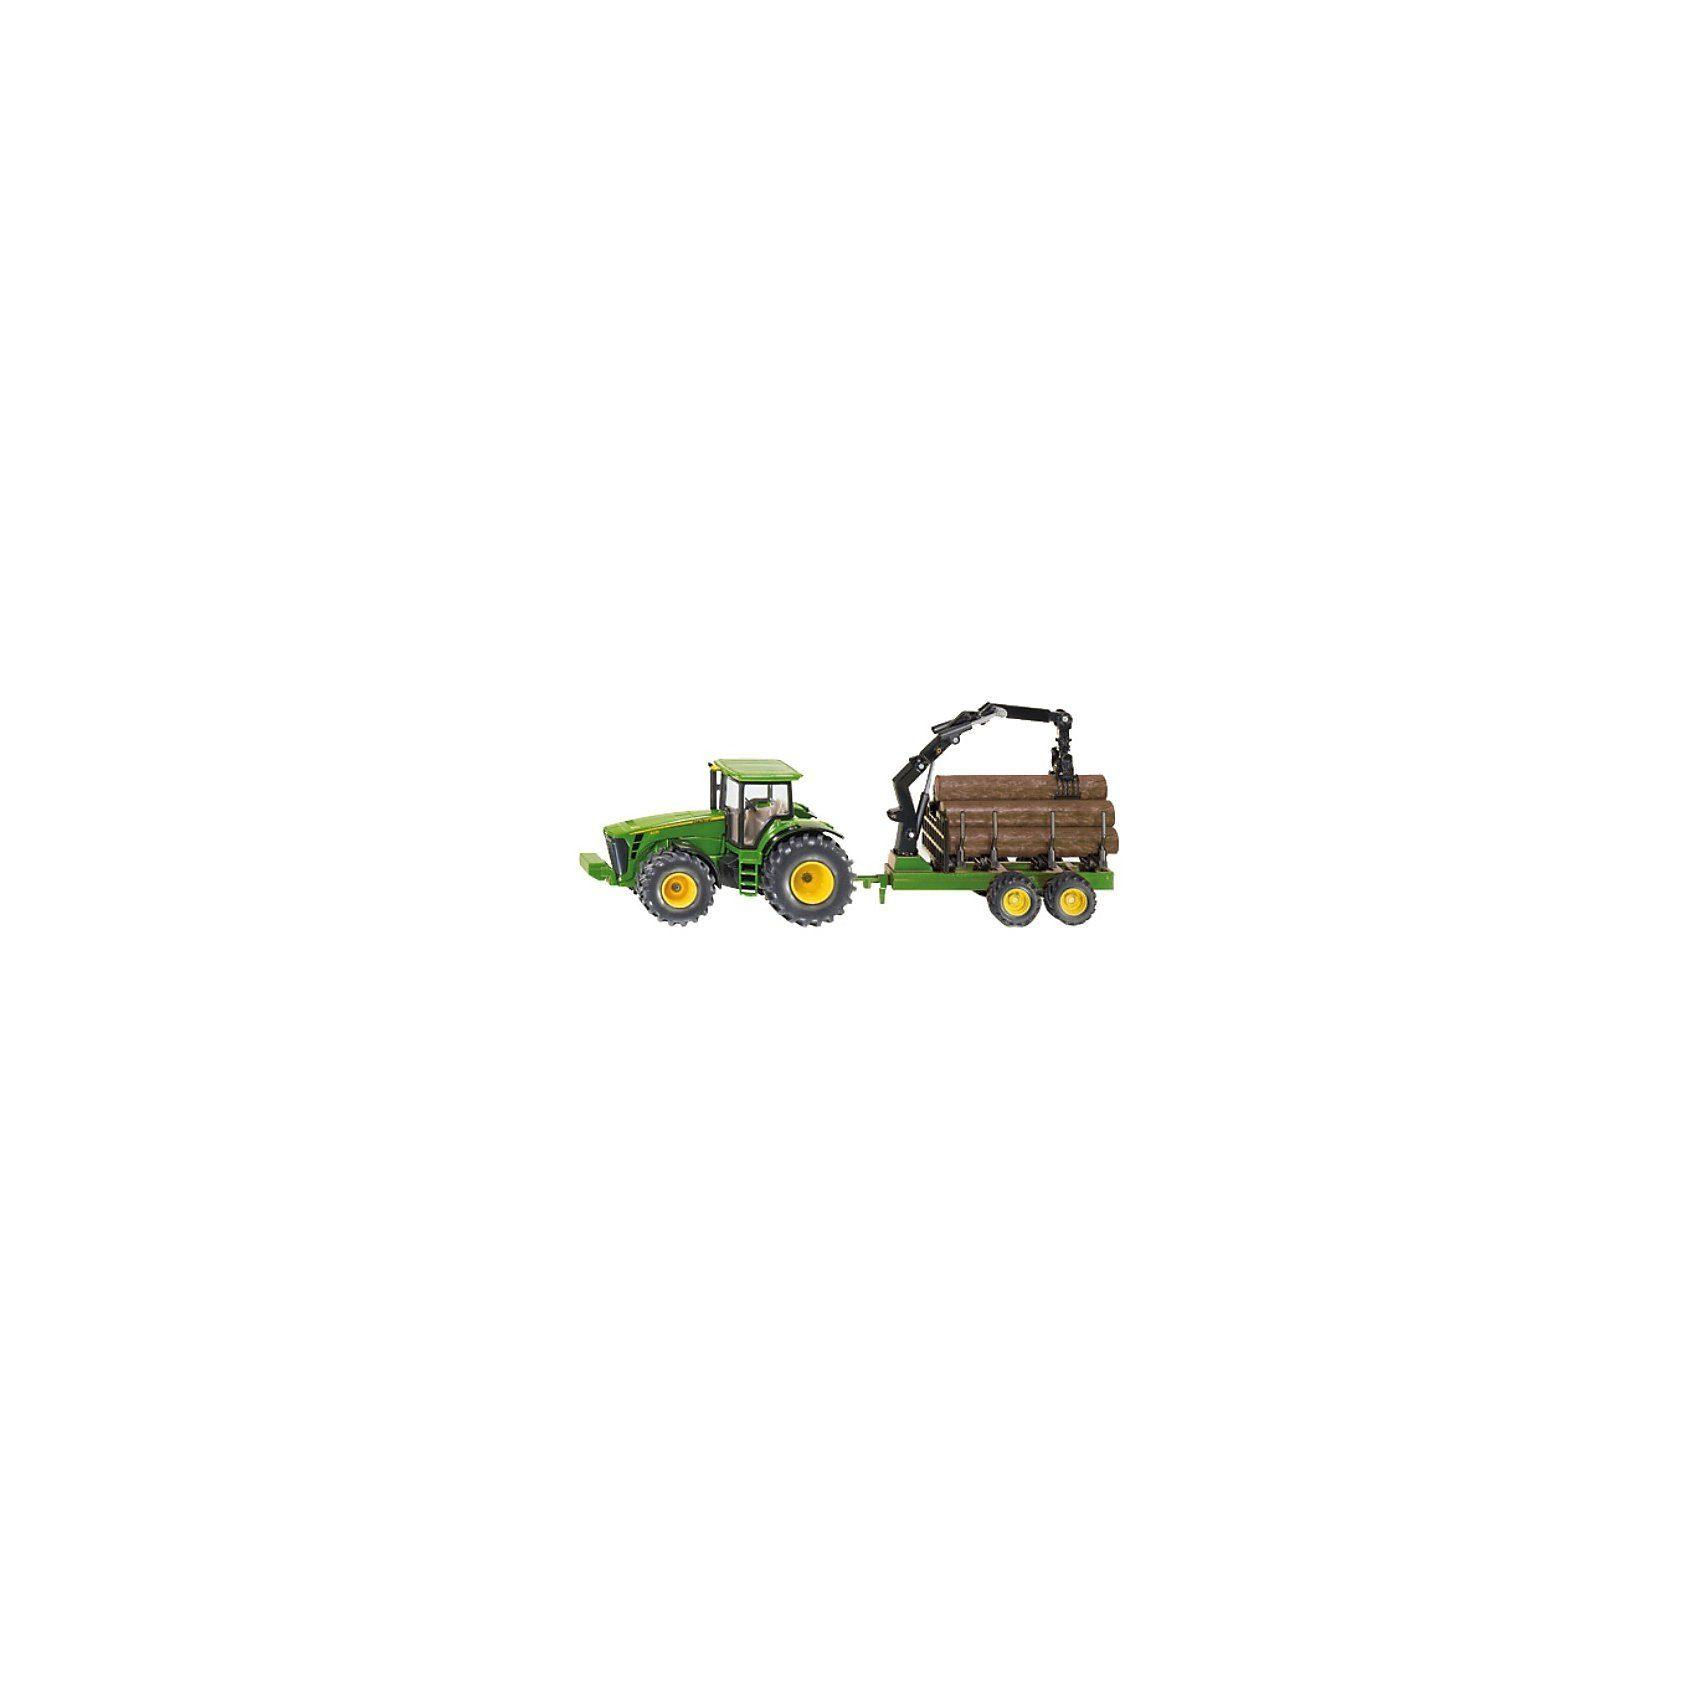 SIKU 1954 Traktor mit Forstanhänger